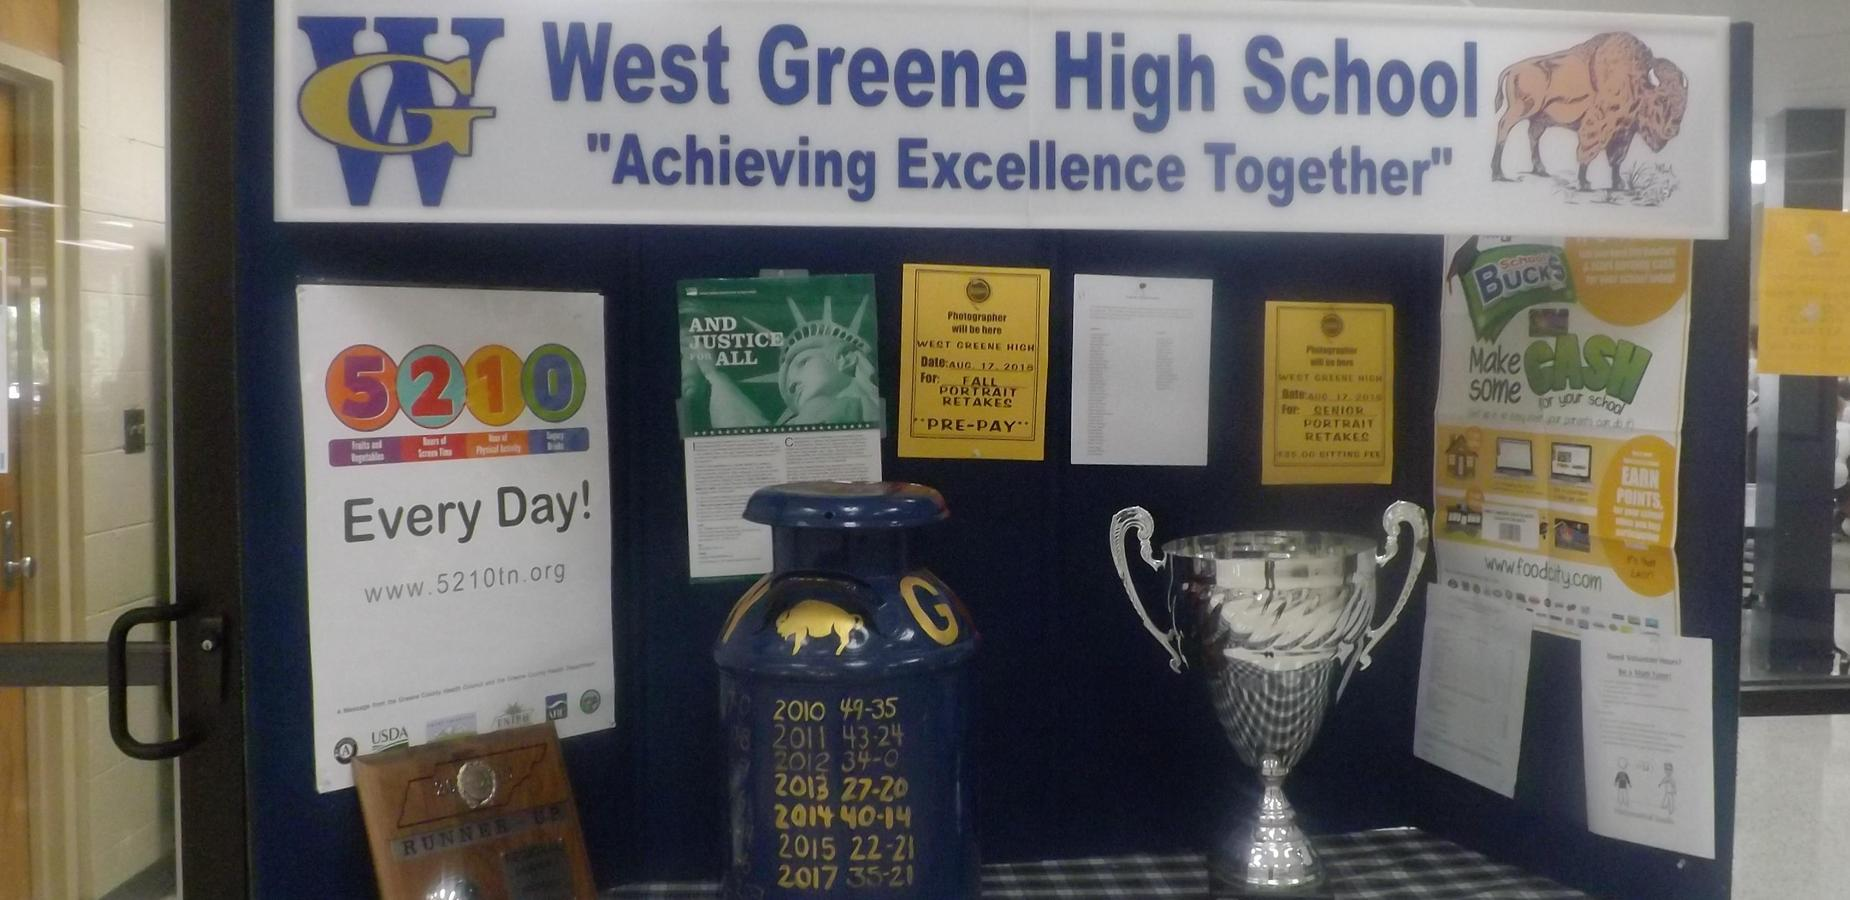 WGHS Lobby Display